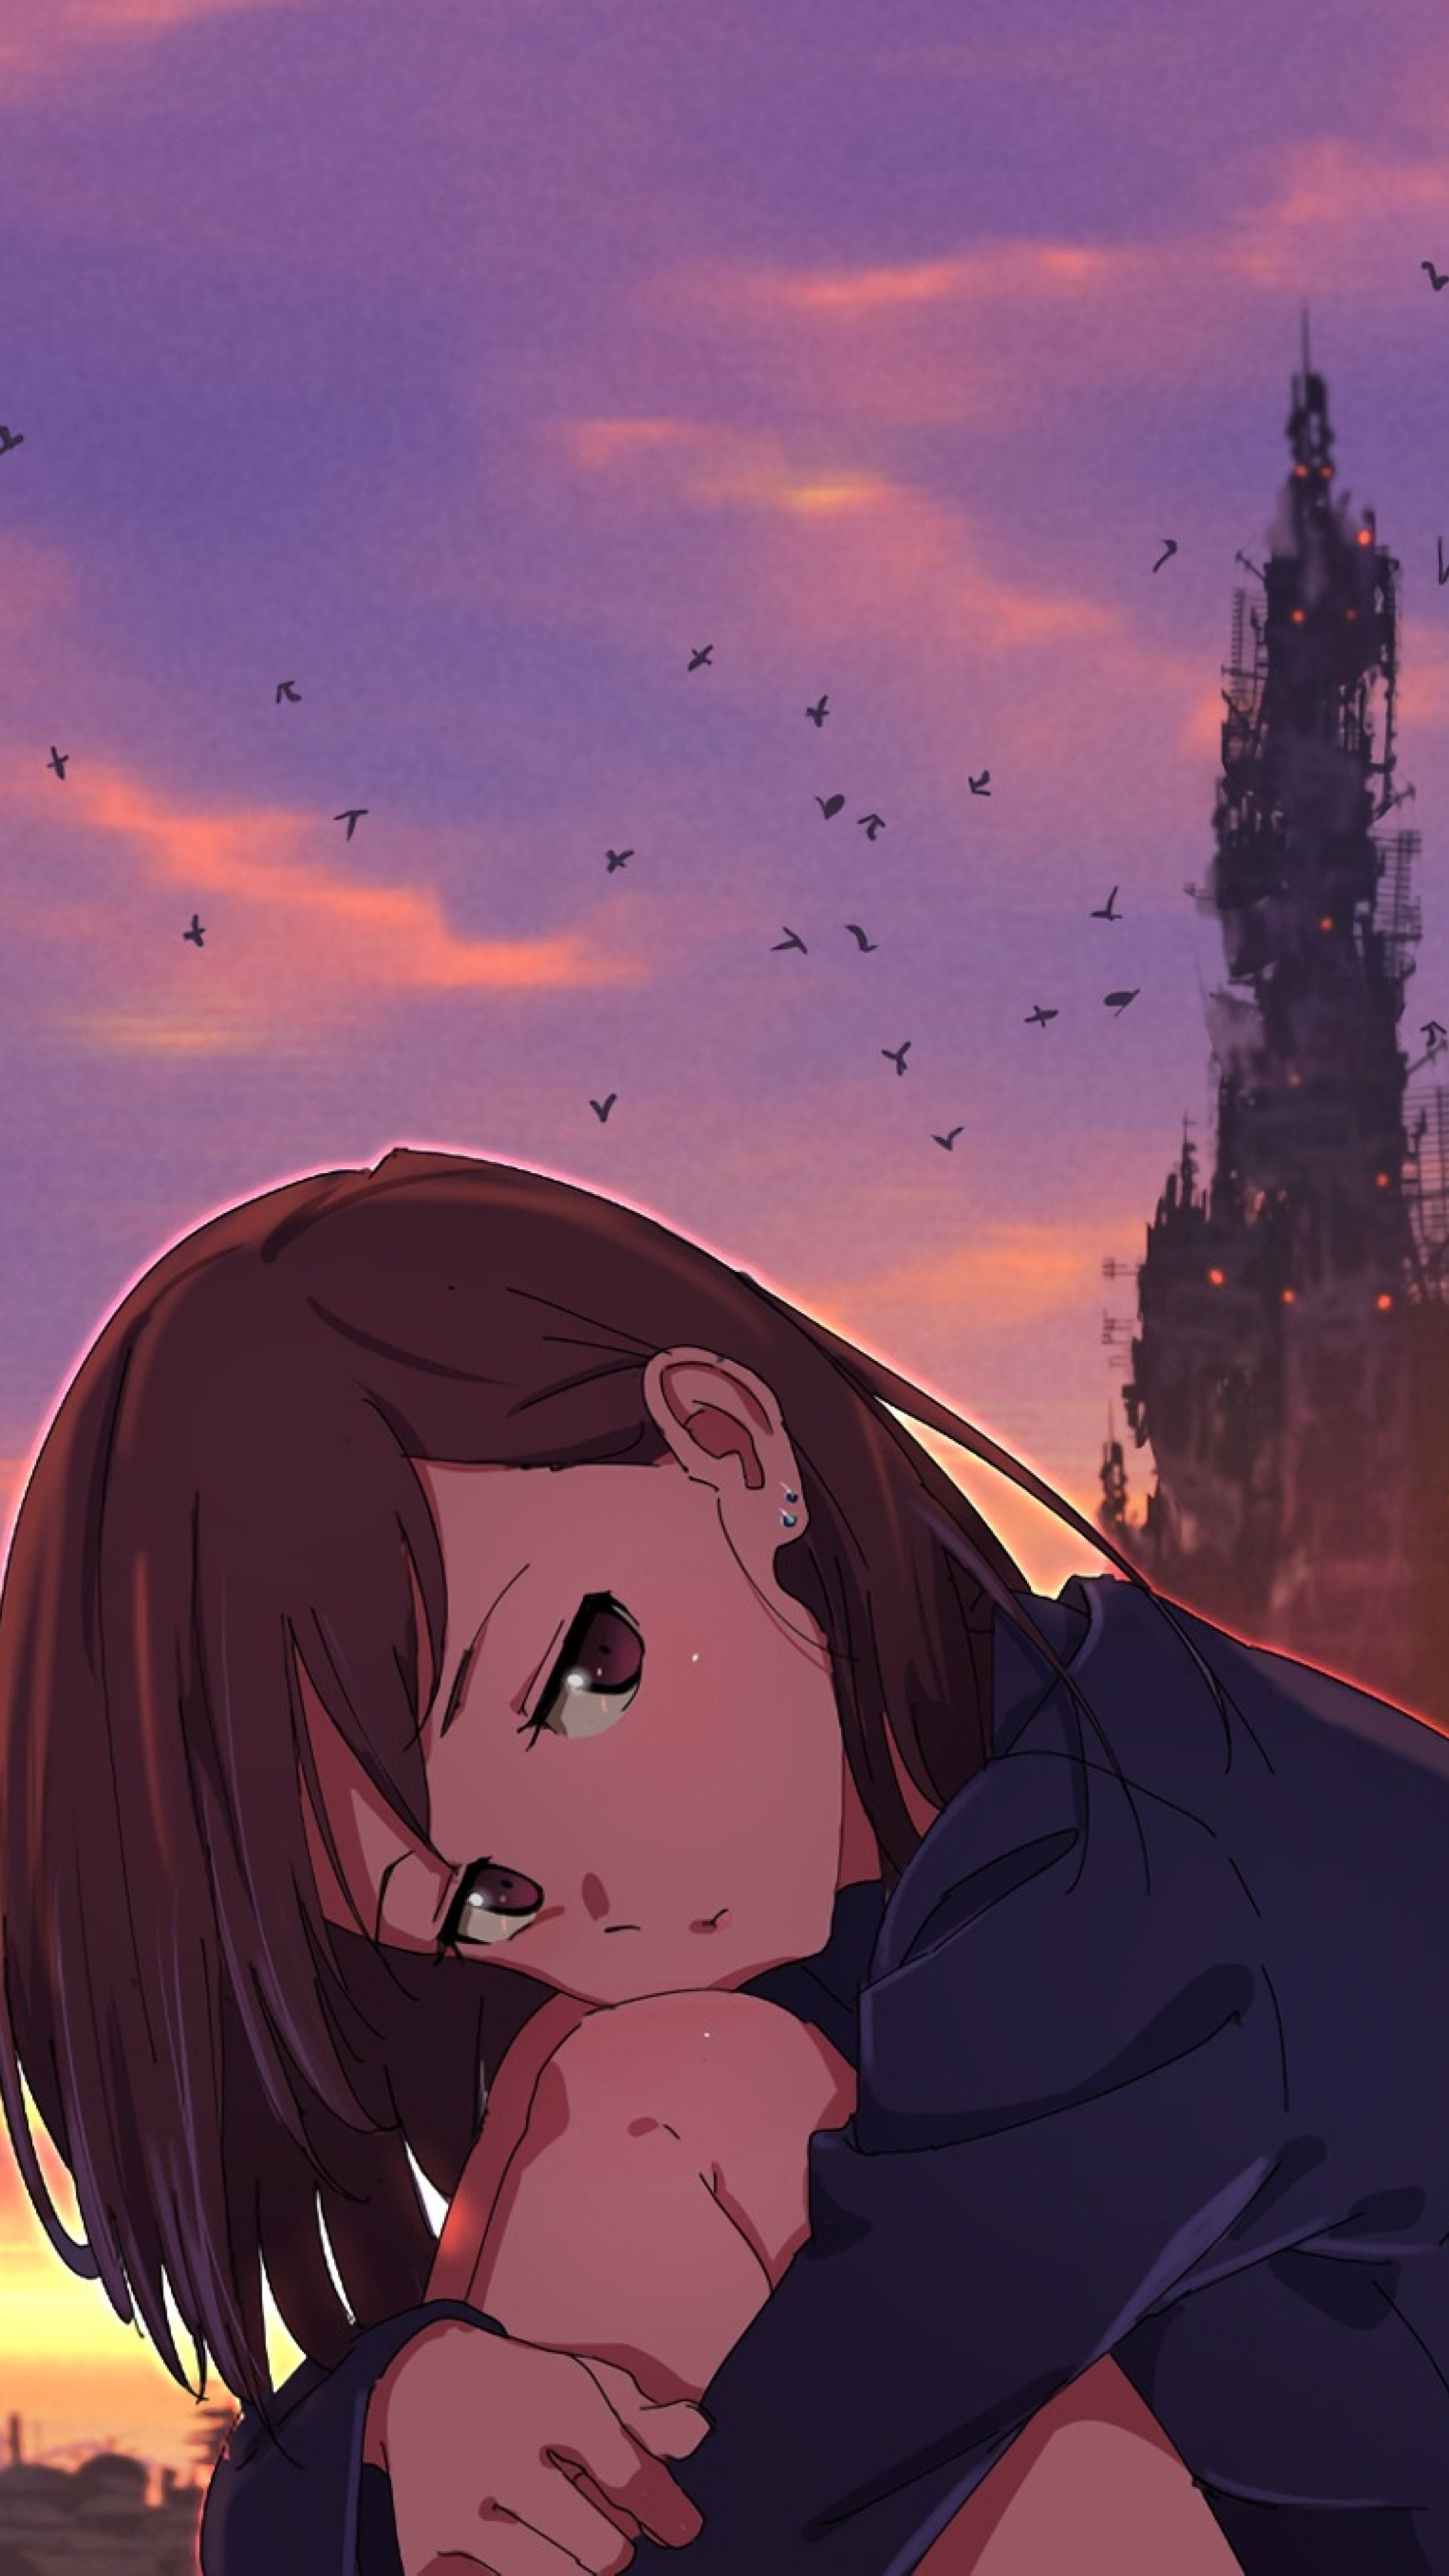 Broken Anime Couple Wallpapers Wallpaper Cave